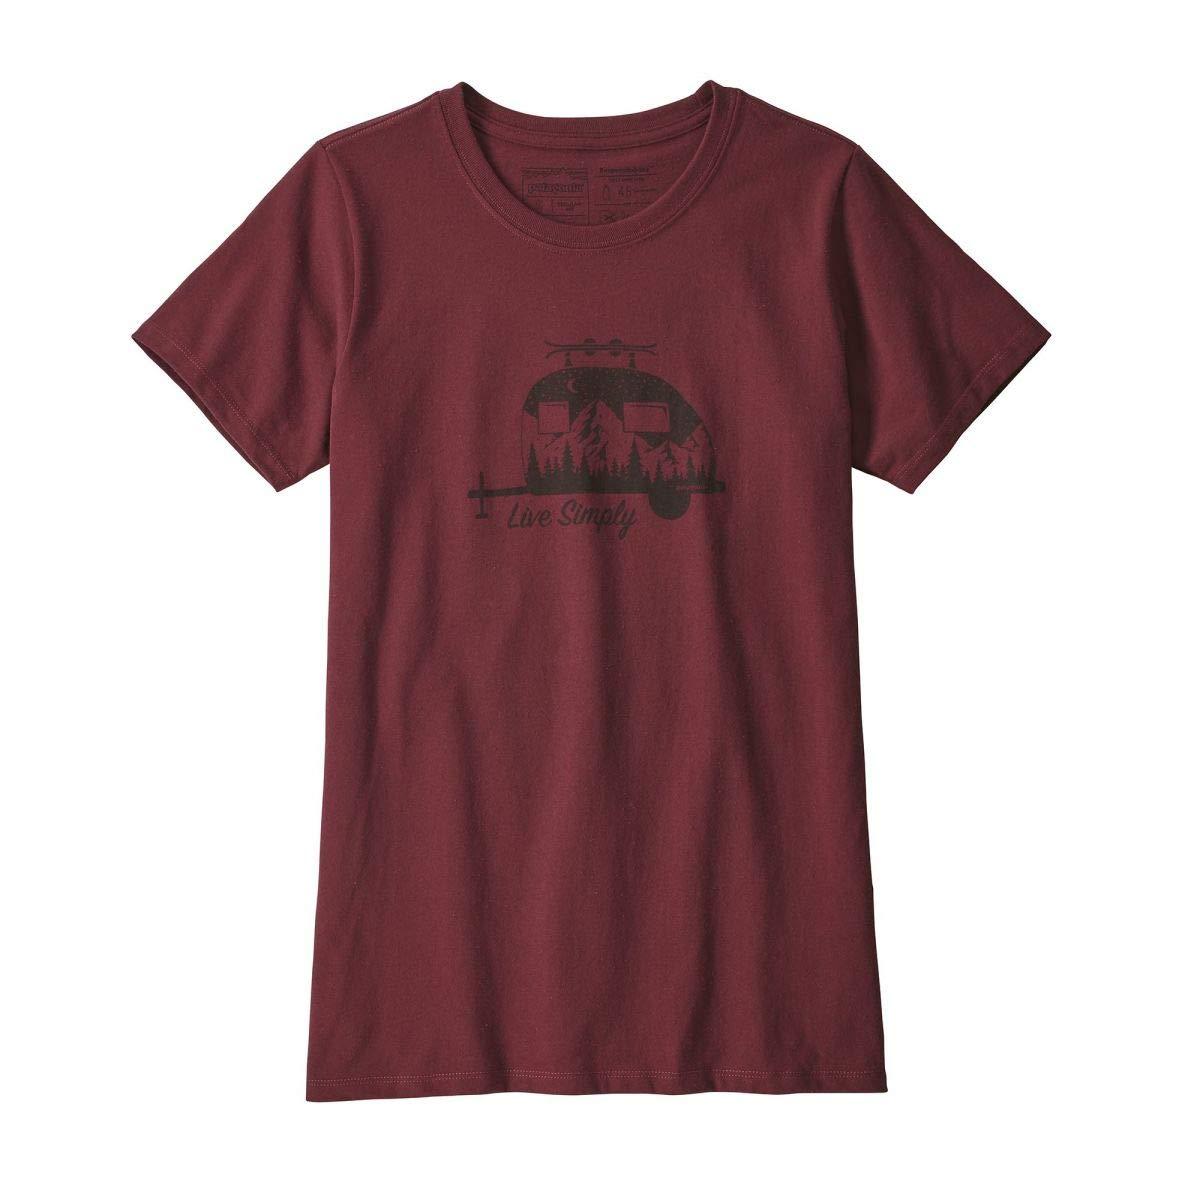 Patagonia Damen Trailer live Simply responsibili t-Shirt Funktionsshirt